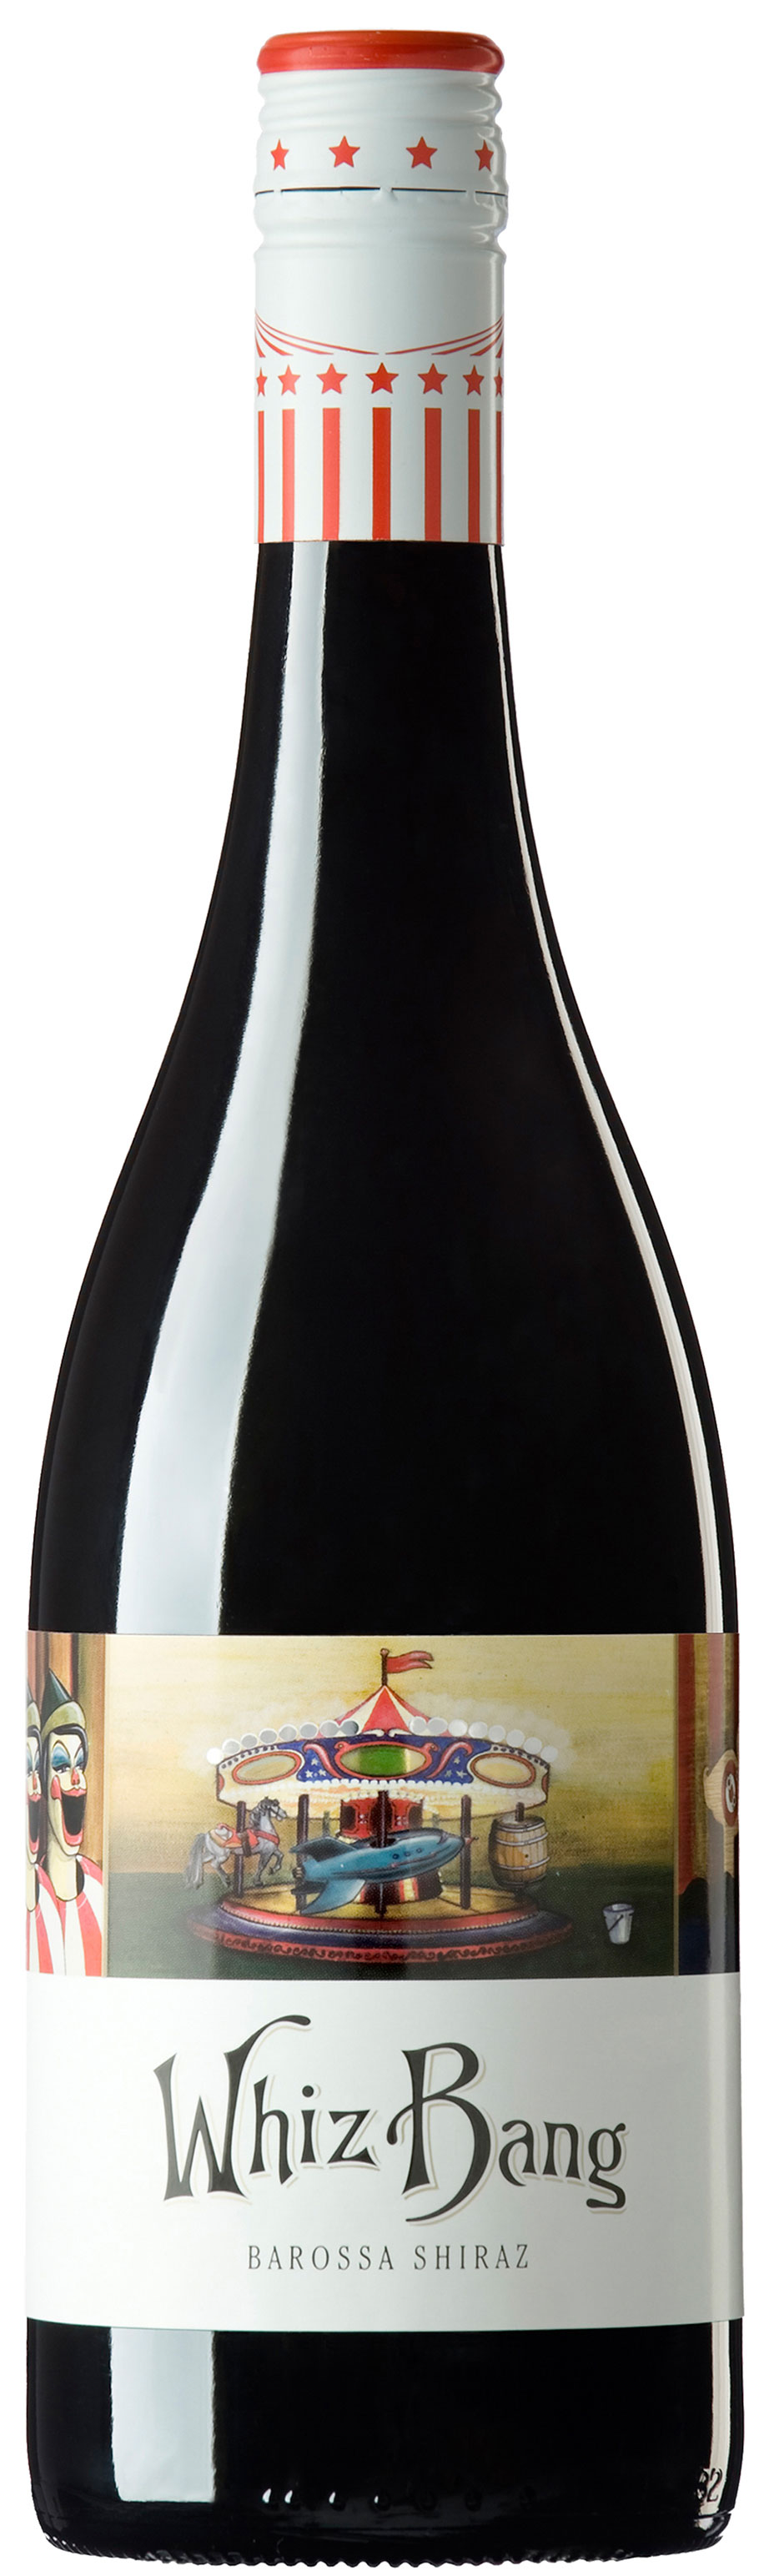 https://vinocorpperu.com/images/vinos/angove/whiz_bang_barossa_shiraz_2017.jpg